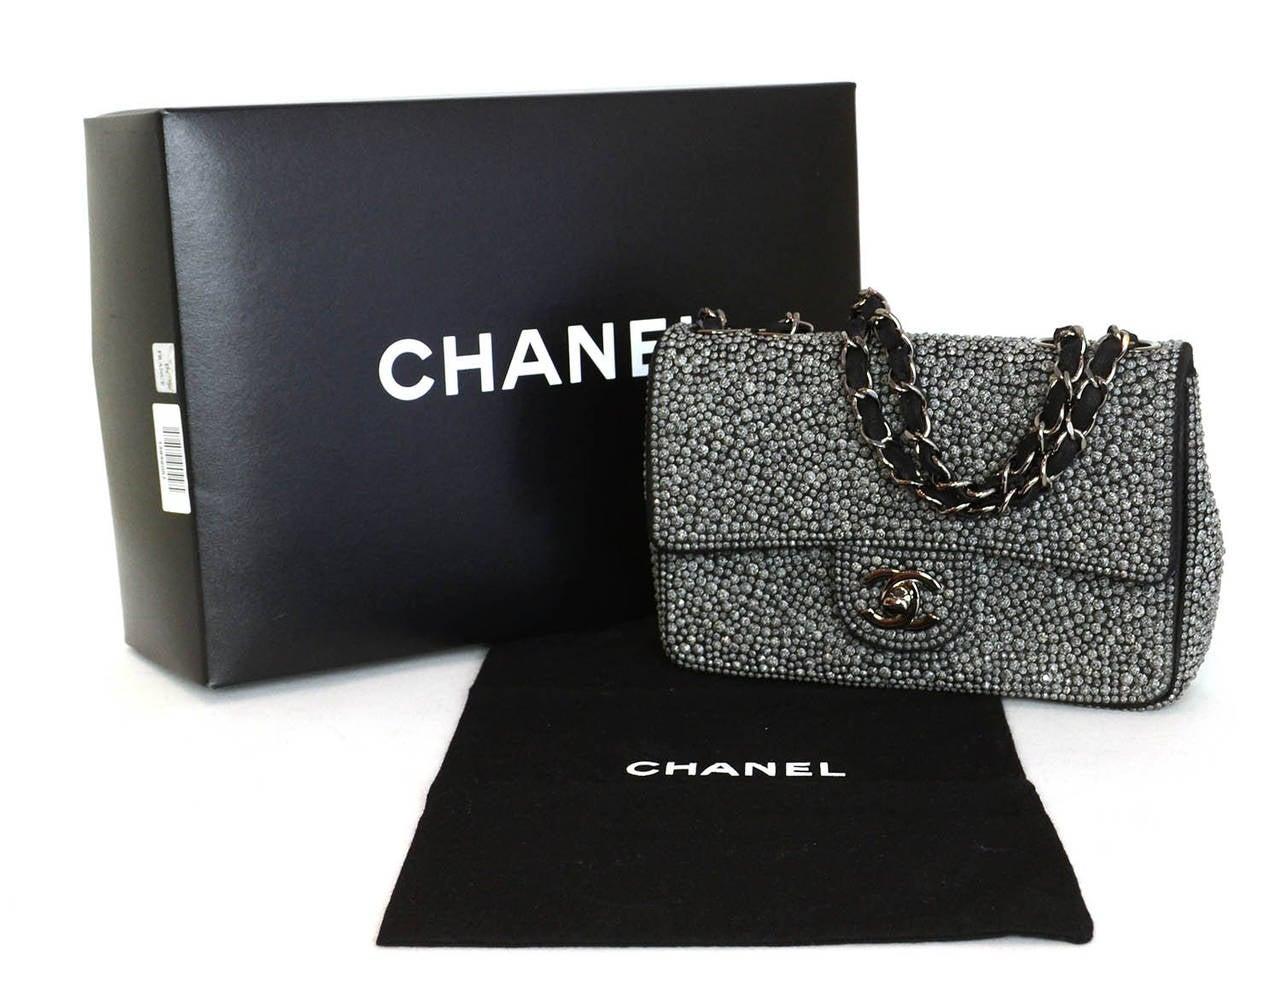 CHANEL 2014 Dark Grey Crystal Mini Classic Flap Evening Bag For Sale 6